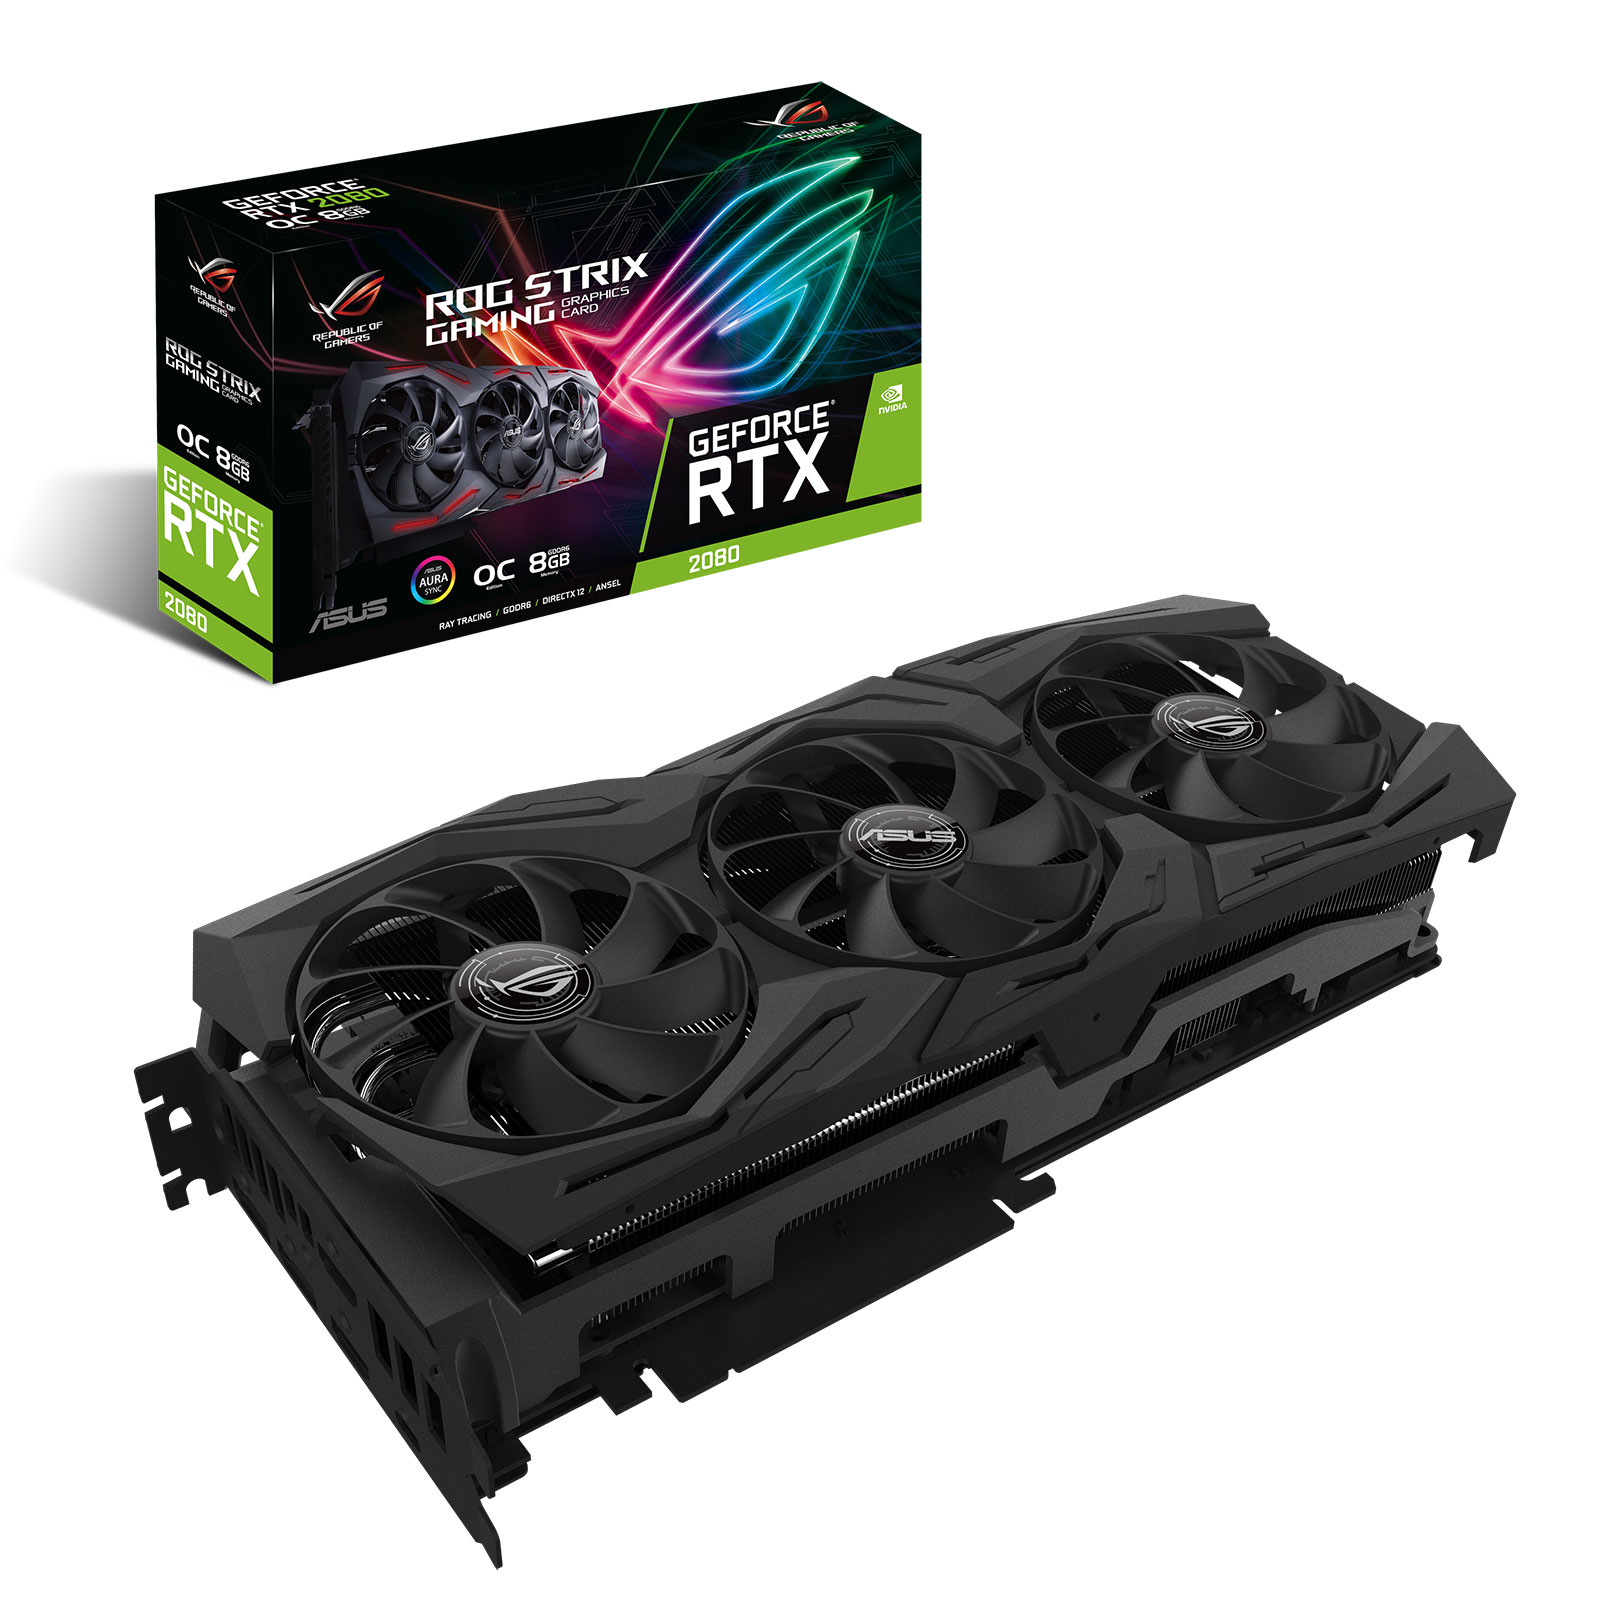 Asus GeForce ROG STRIX-RTX2080-O8G-GAMING (90YV0C60-M0NM00) - Achat / Vente Carte graphique sur Cybertek.fr - 0